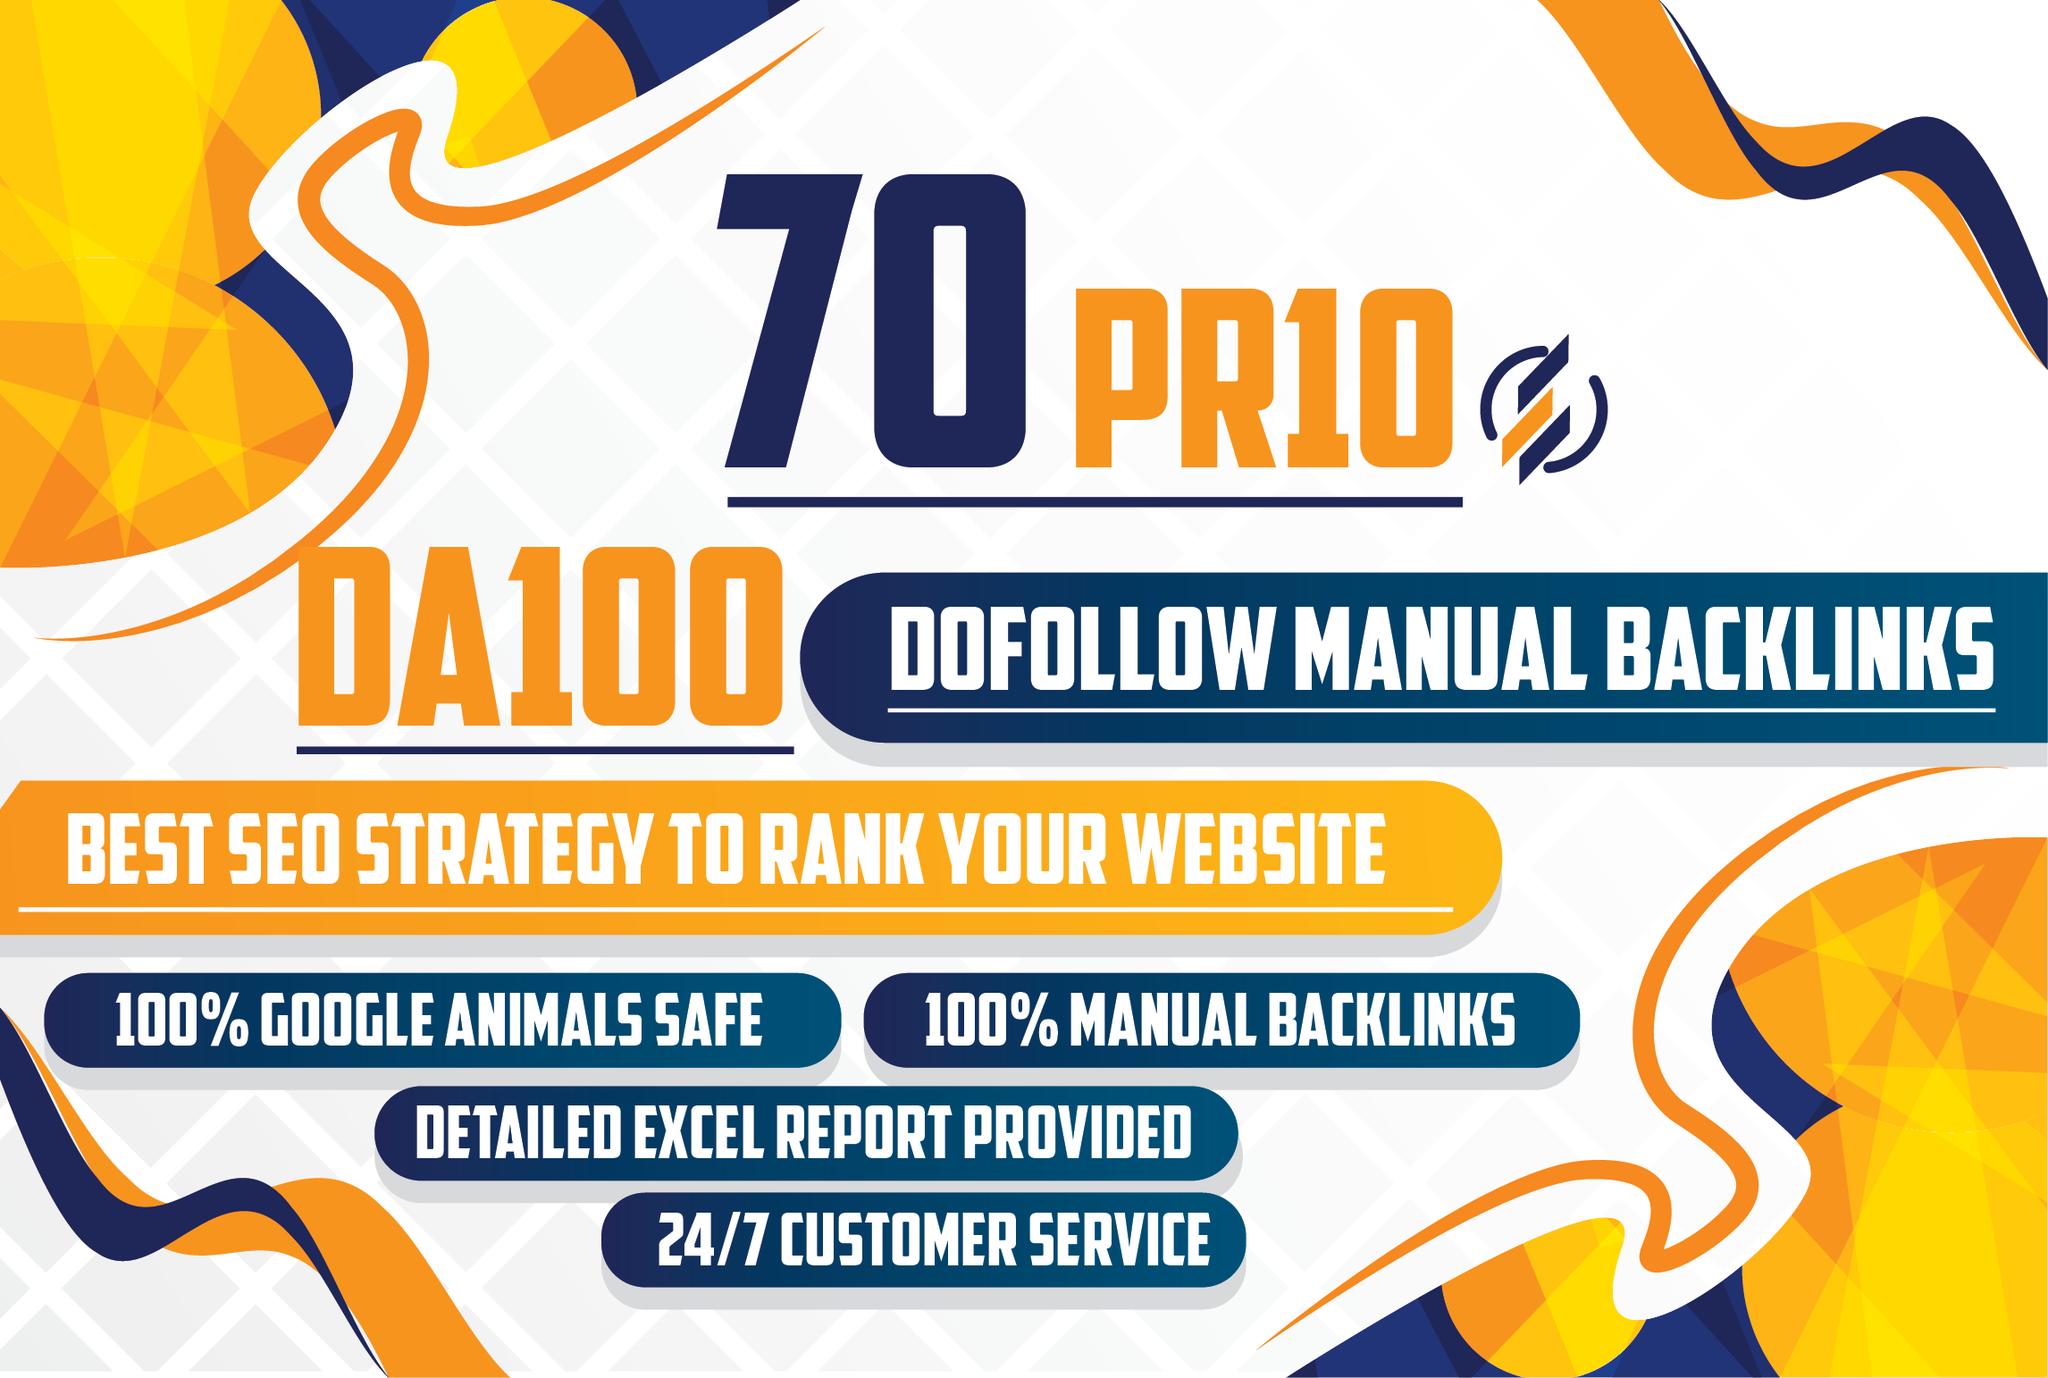 I will Do Manual 70 UNIQUE WHITE HAT SEO Backlinks PR10 websites